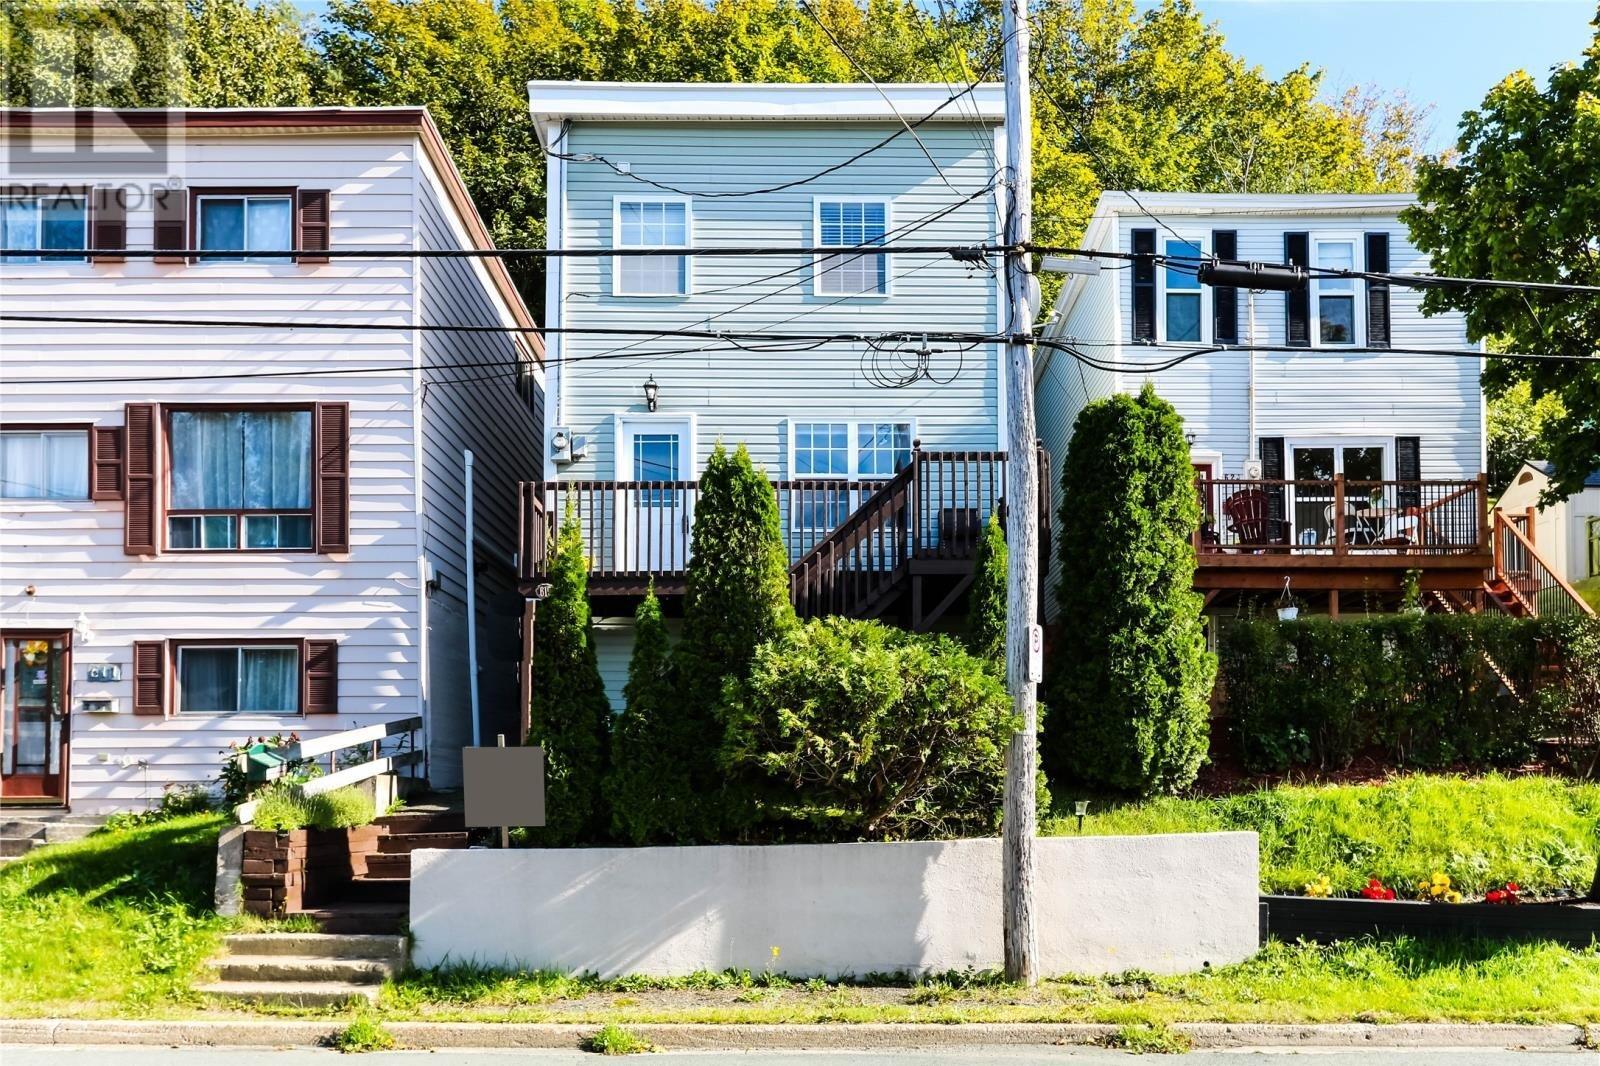 House for sale at 619 Southside Rd St. John's Newfoundland - MLS: 1221362